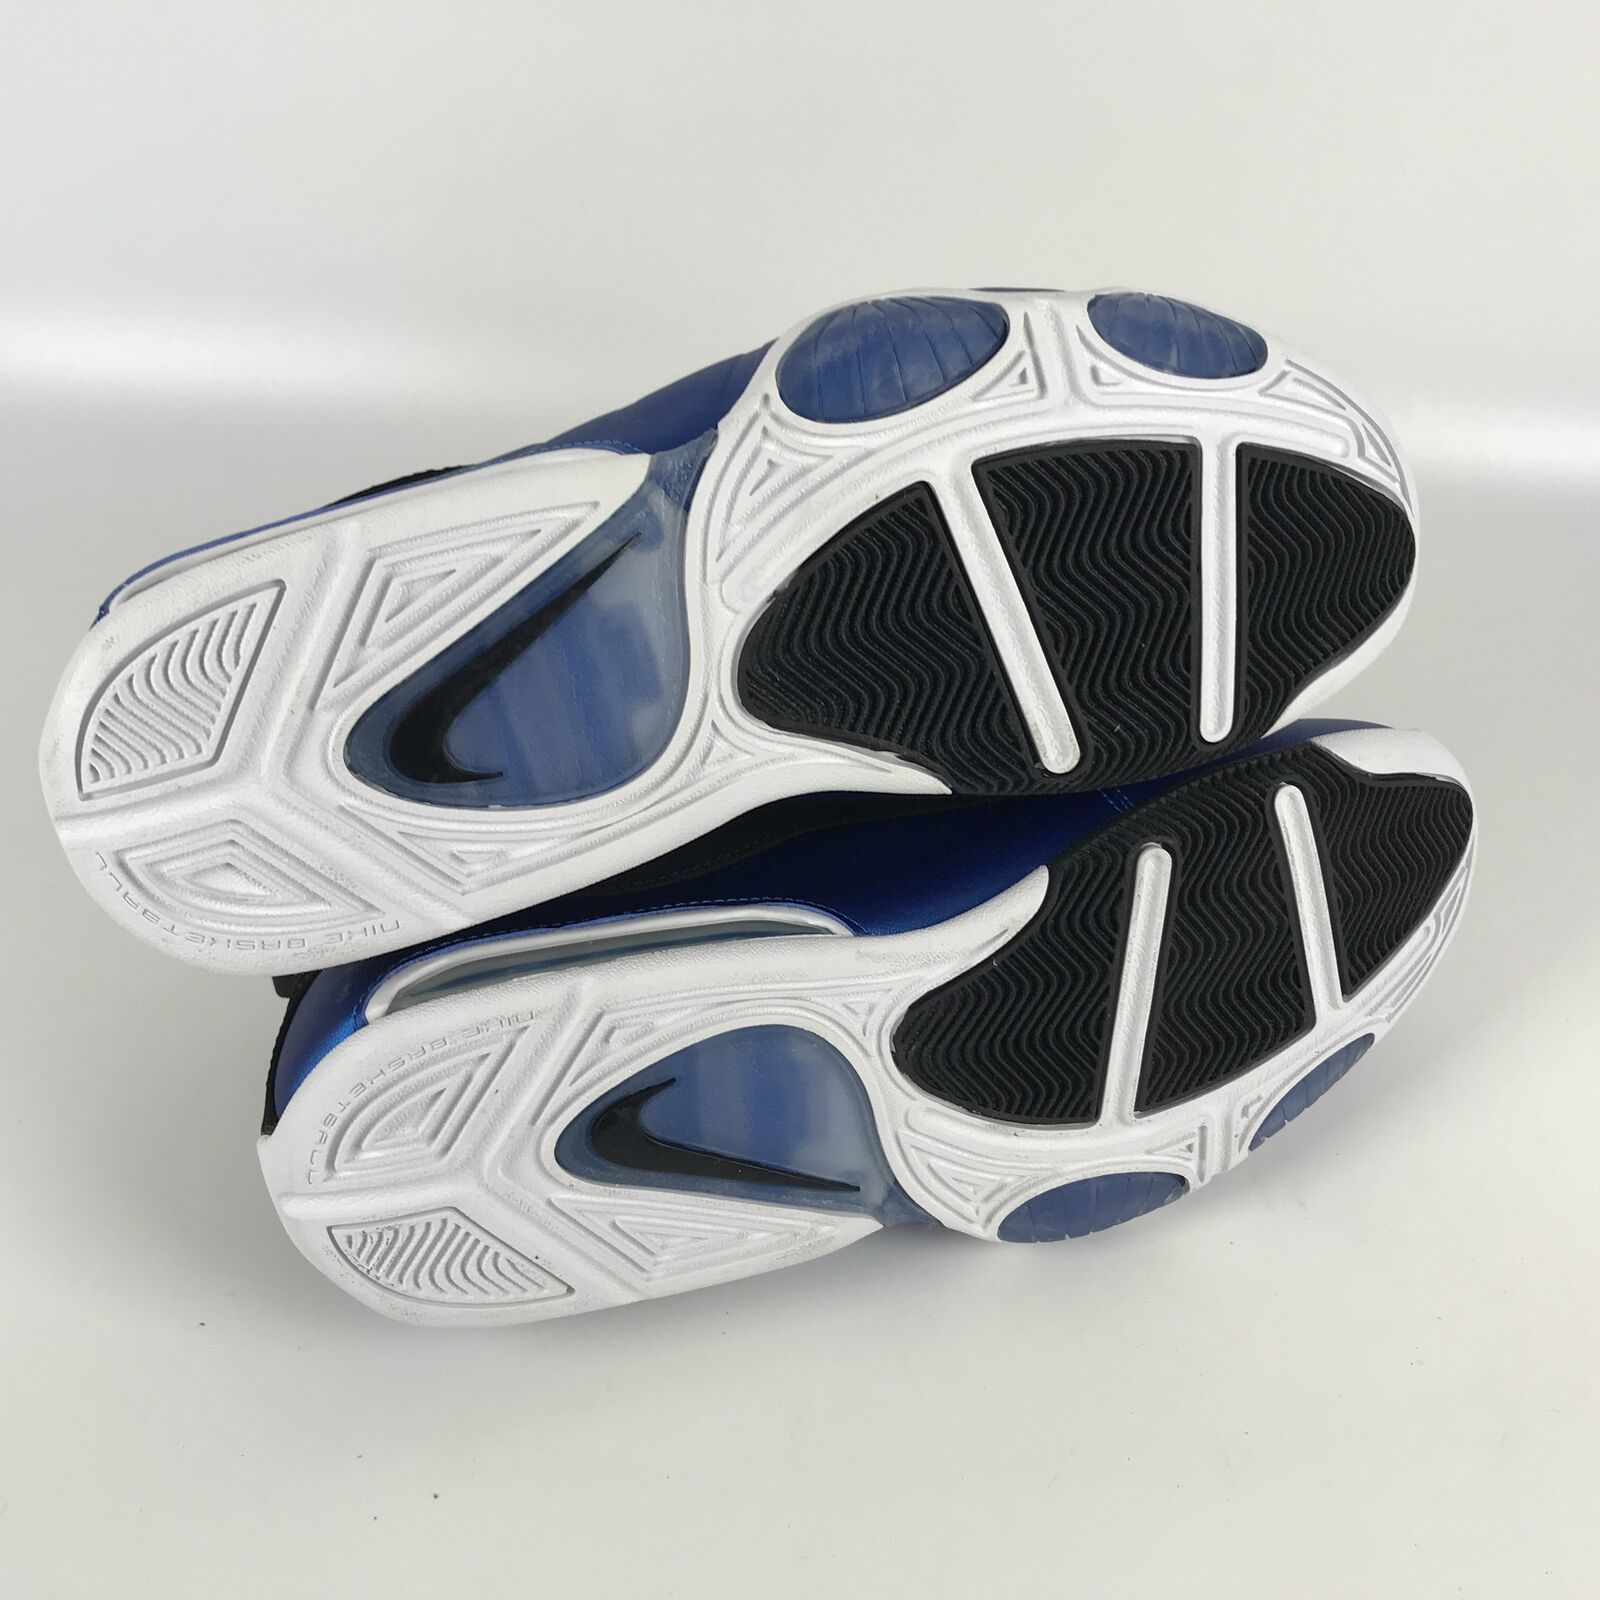 Nike Air Max WAVY Men's size 11 Basketball Shoes Penny Blue Black AV8061 002 image 7